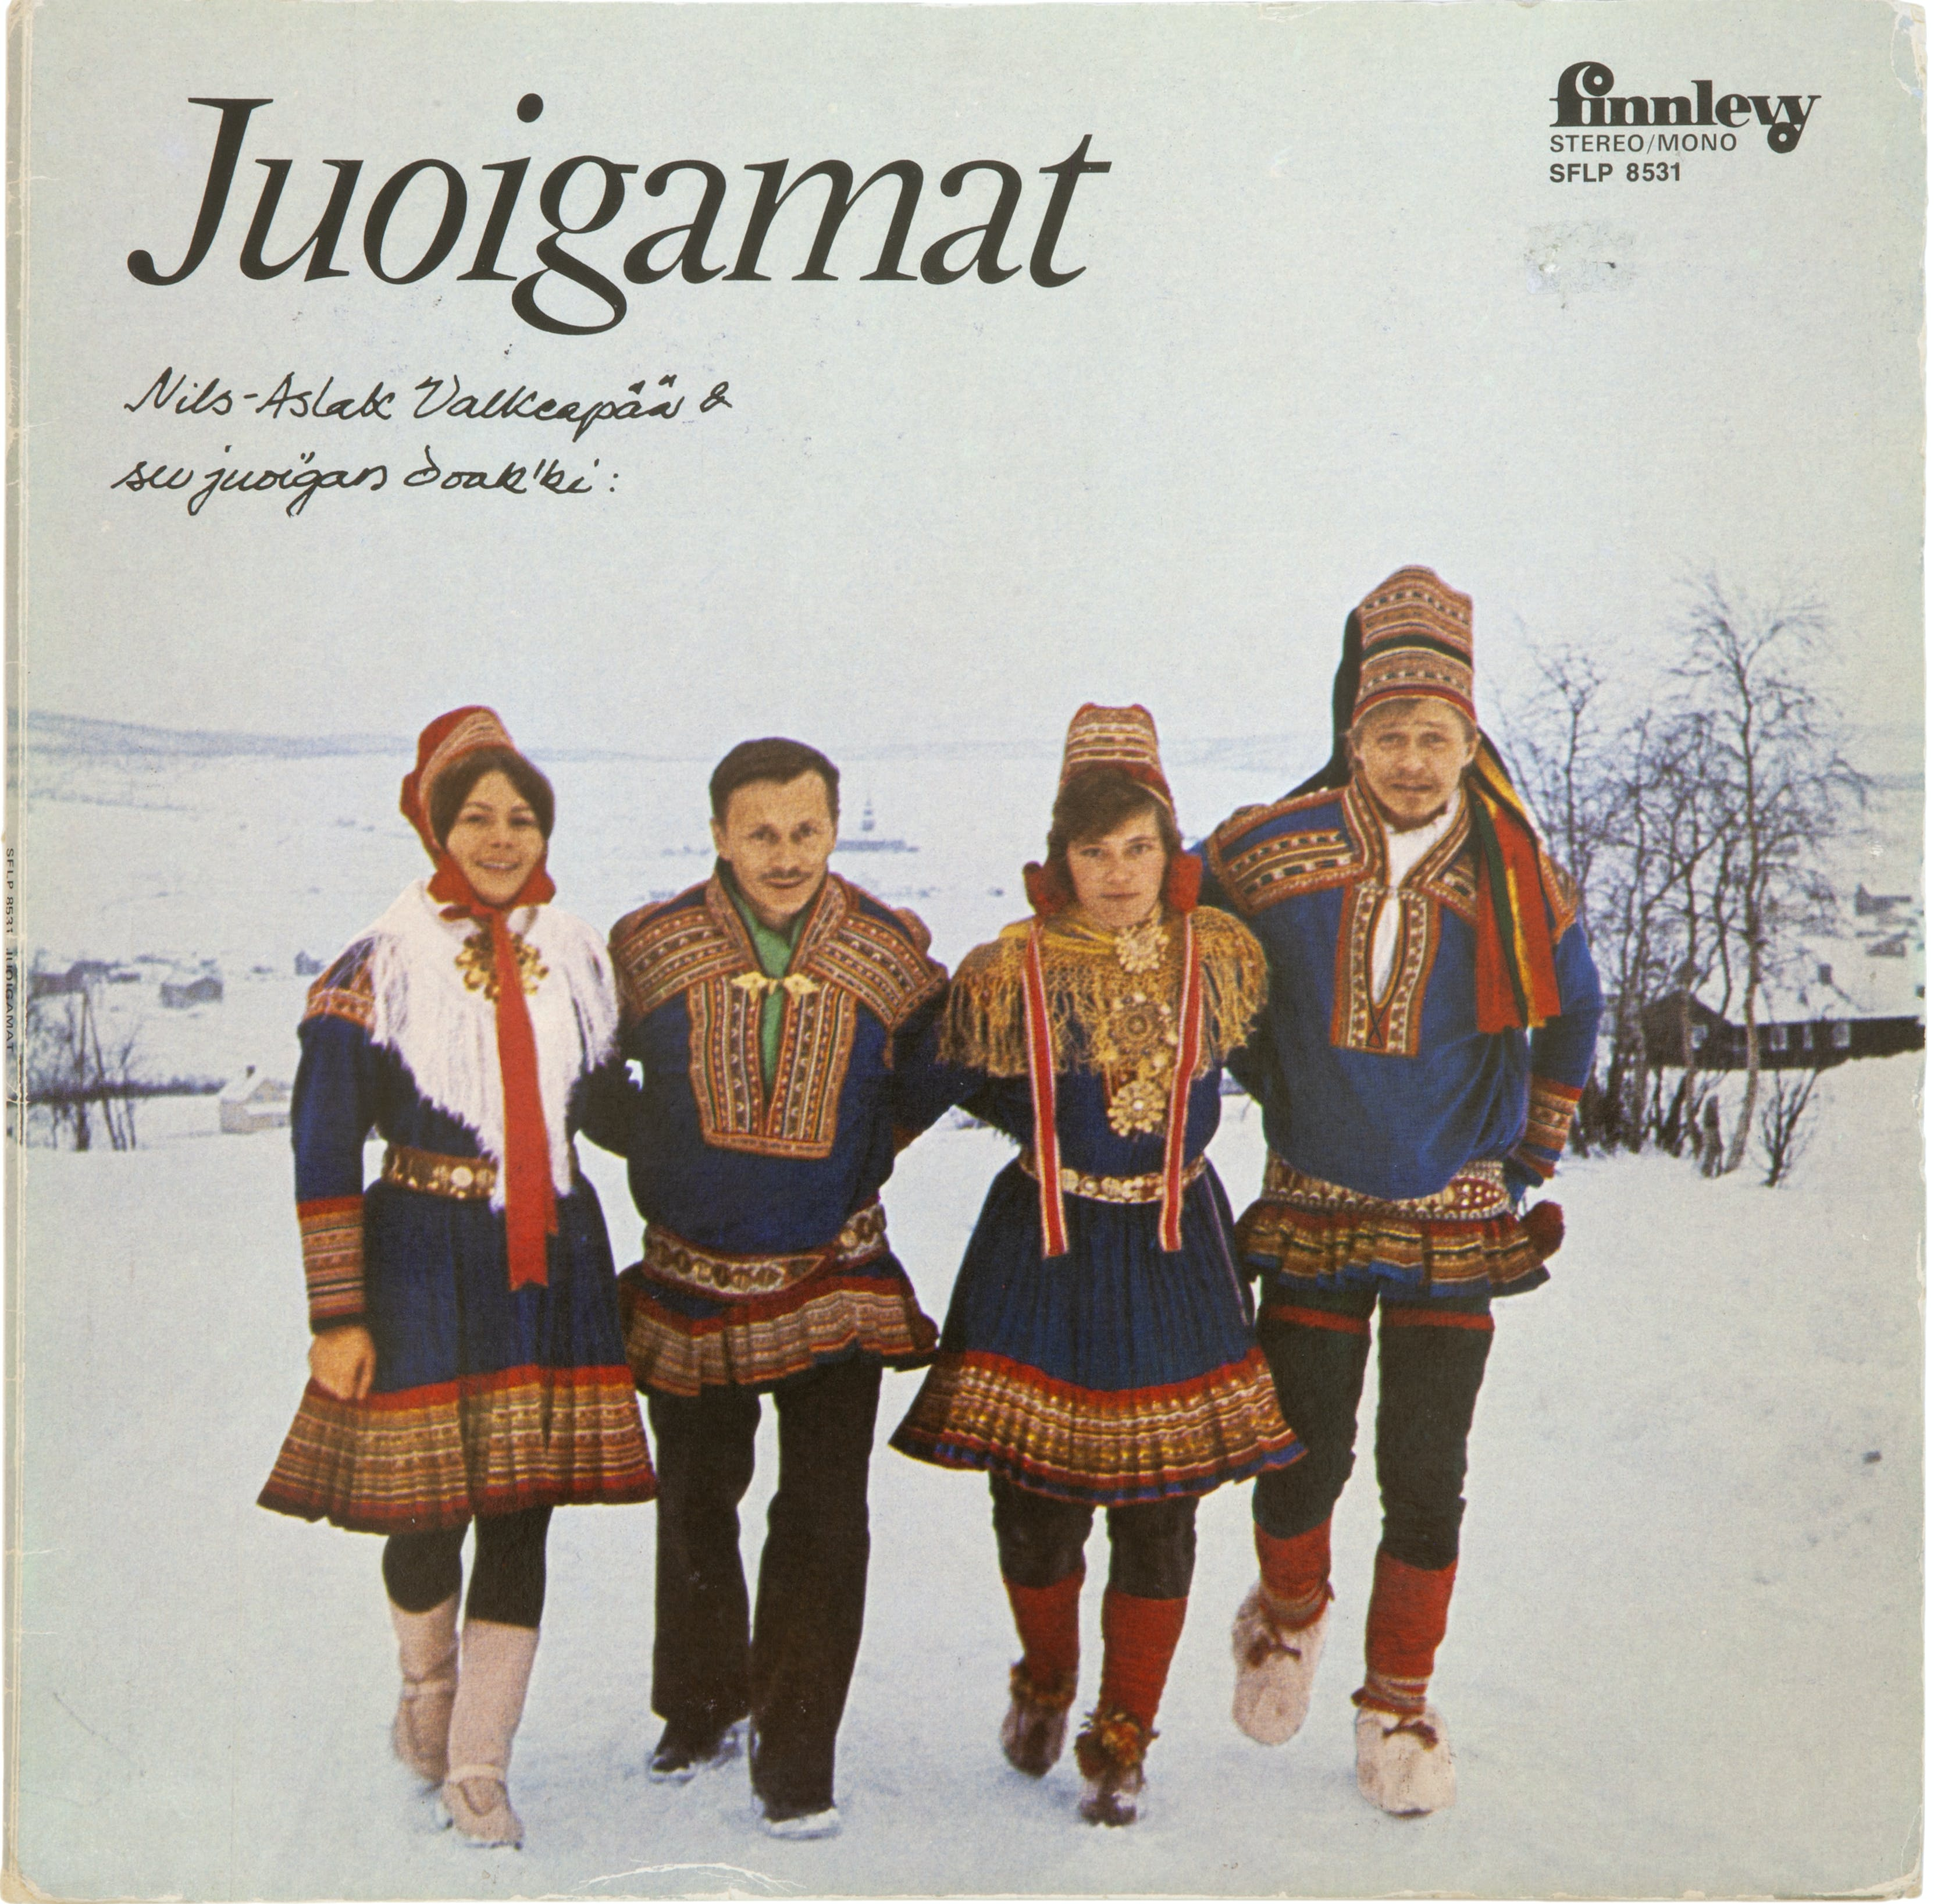 Juoigamat 1973 Foto Ulf Carlsson